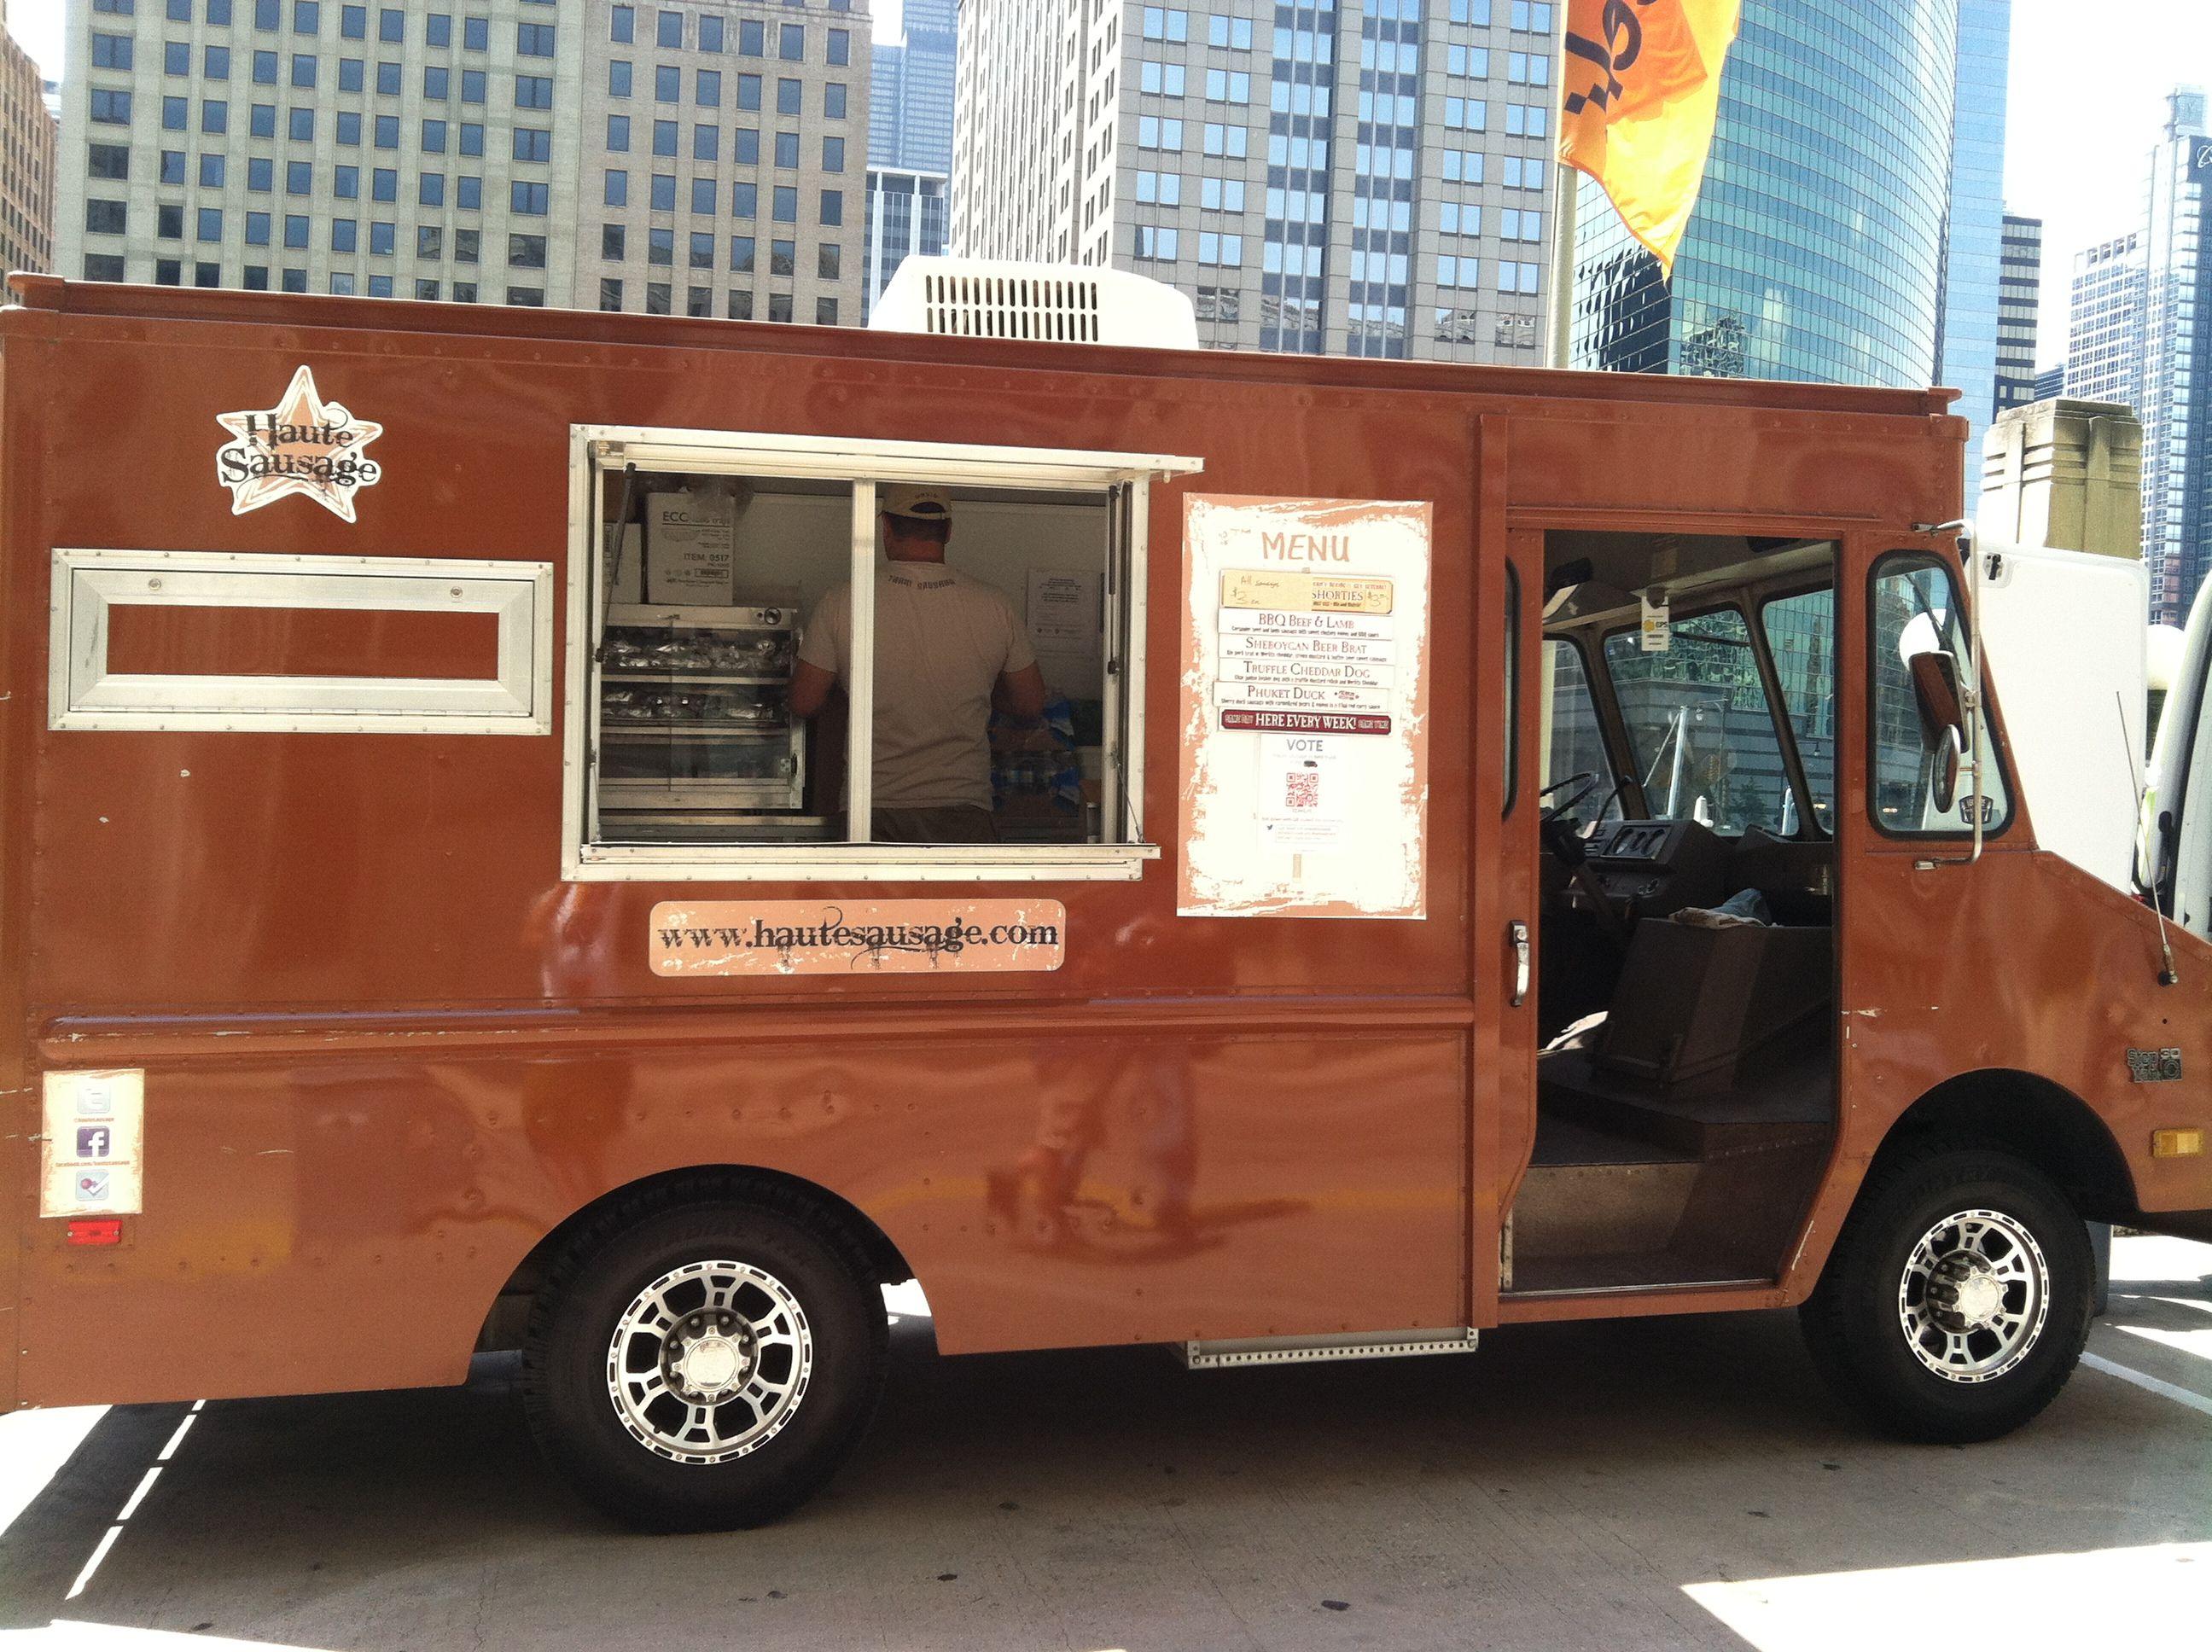 Haute sausage gourmet sausage sandwiches food truck